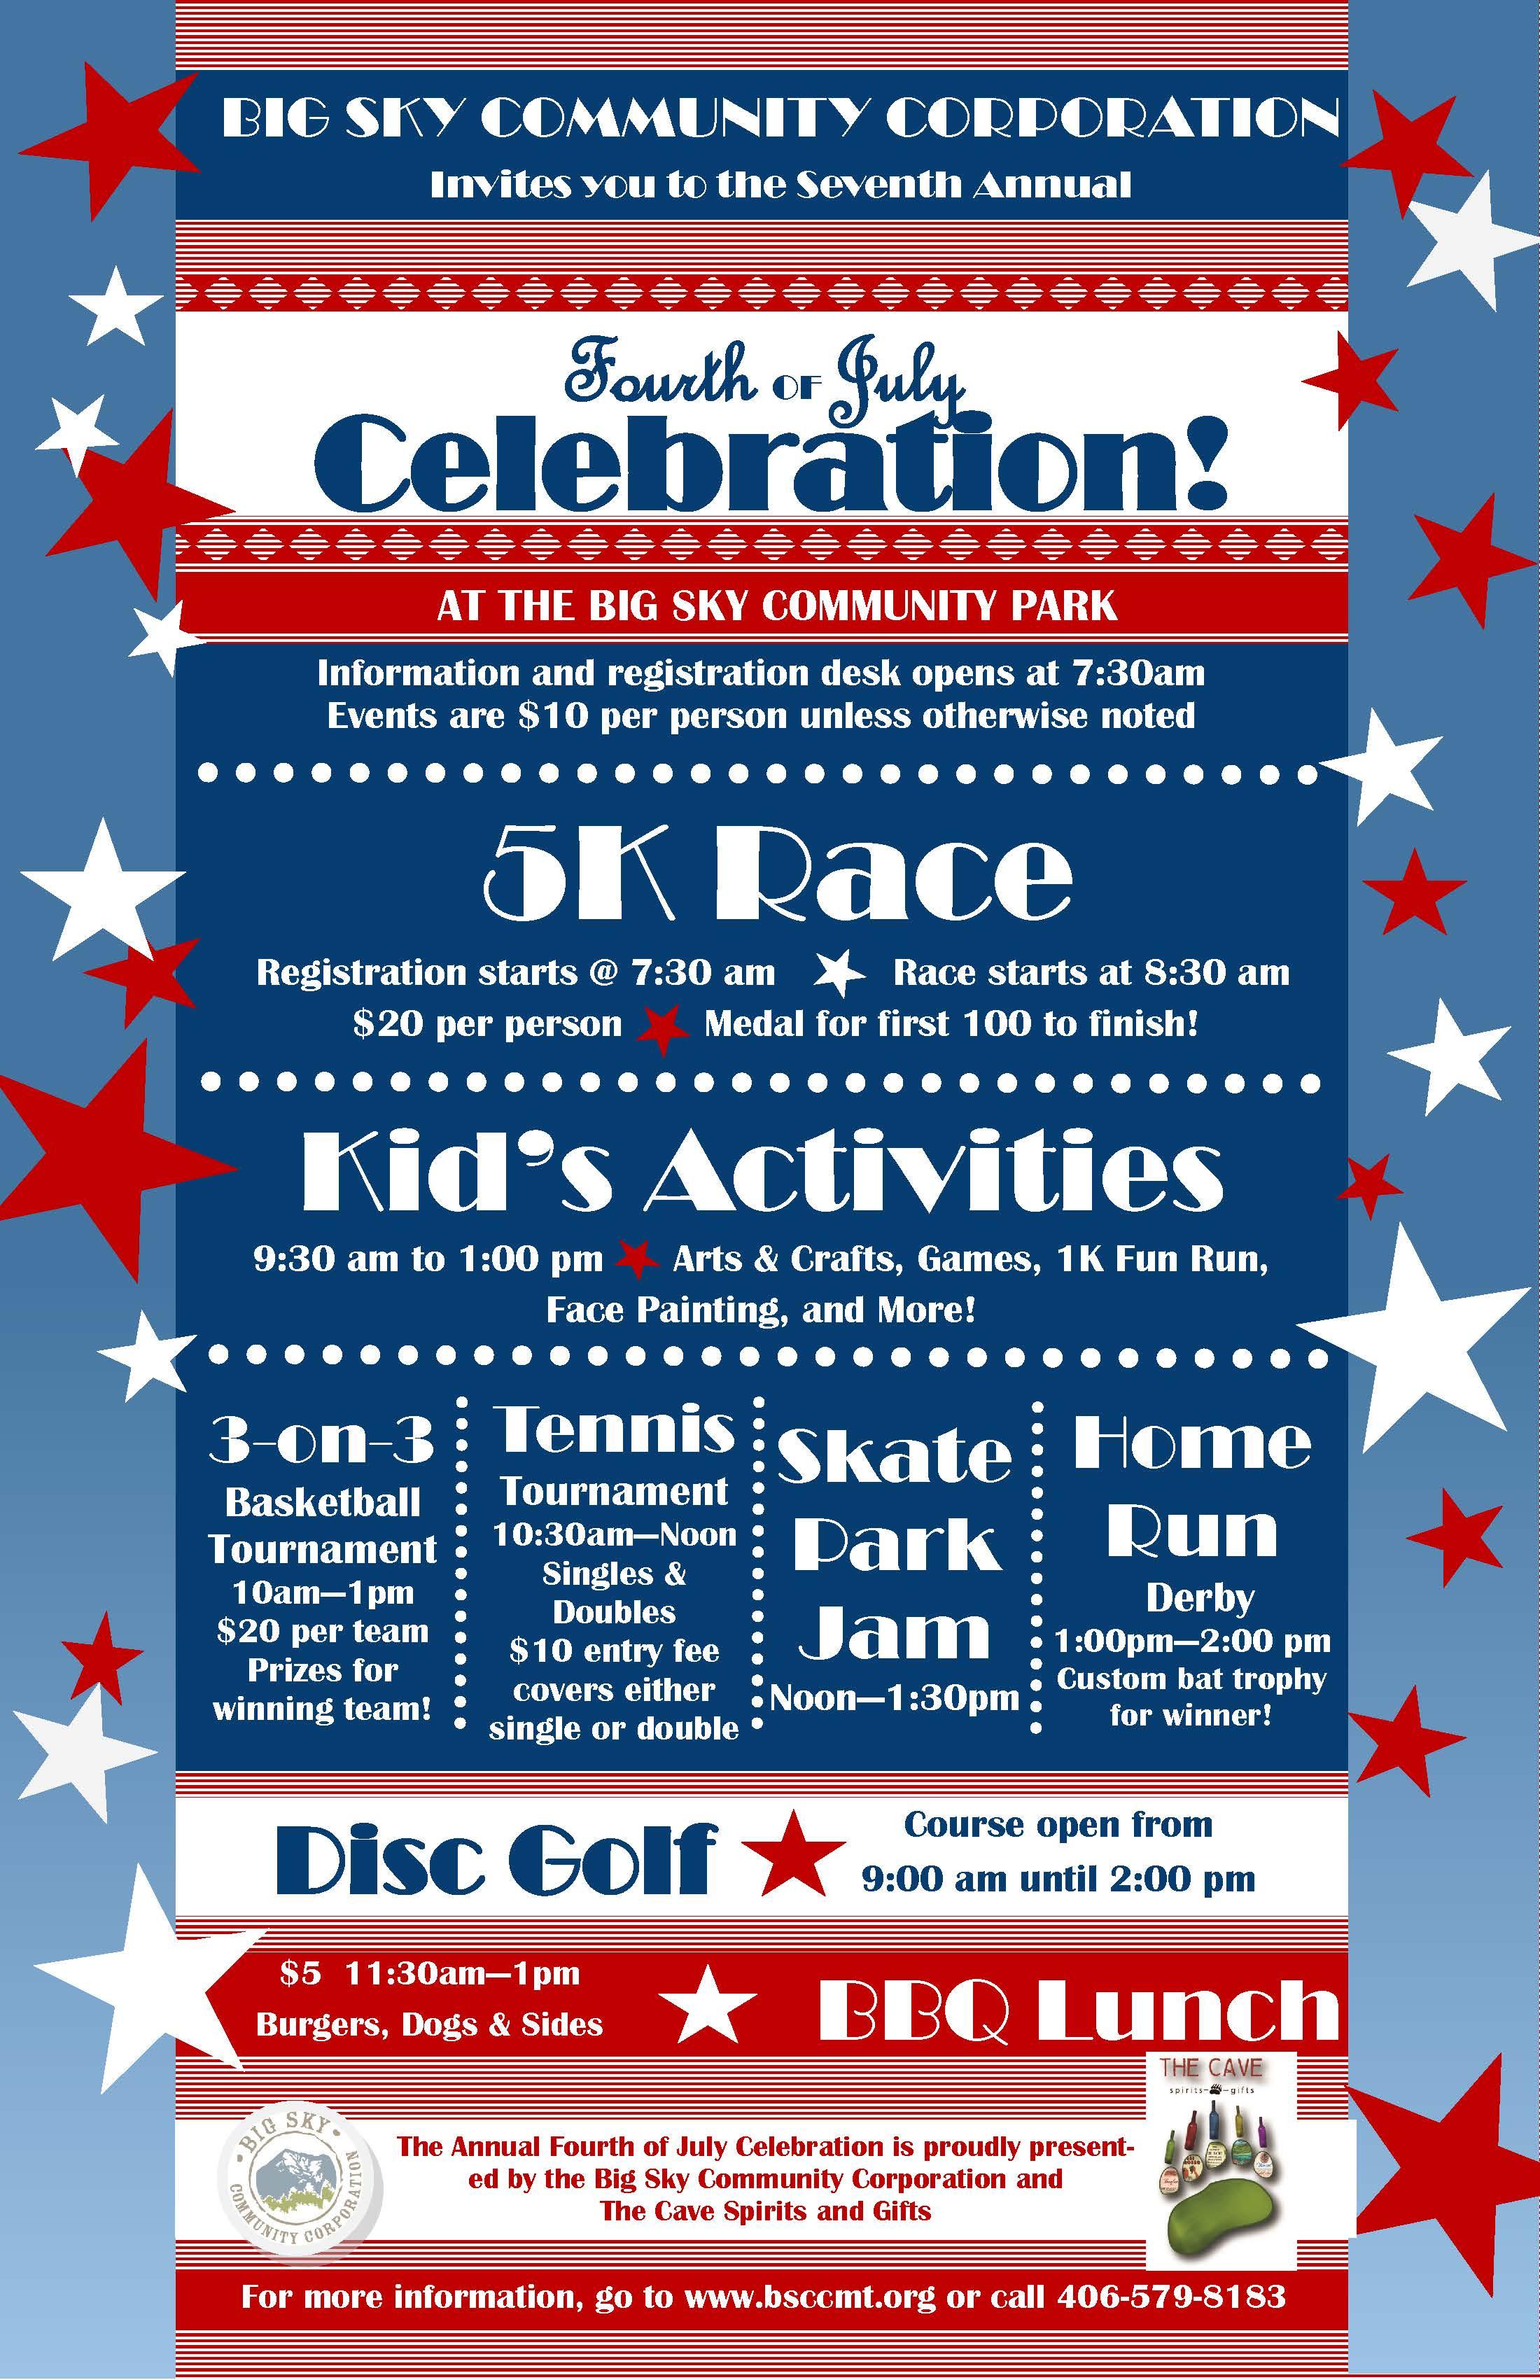 4th of July Celebration - Big Sky Community Organization